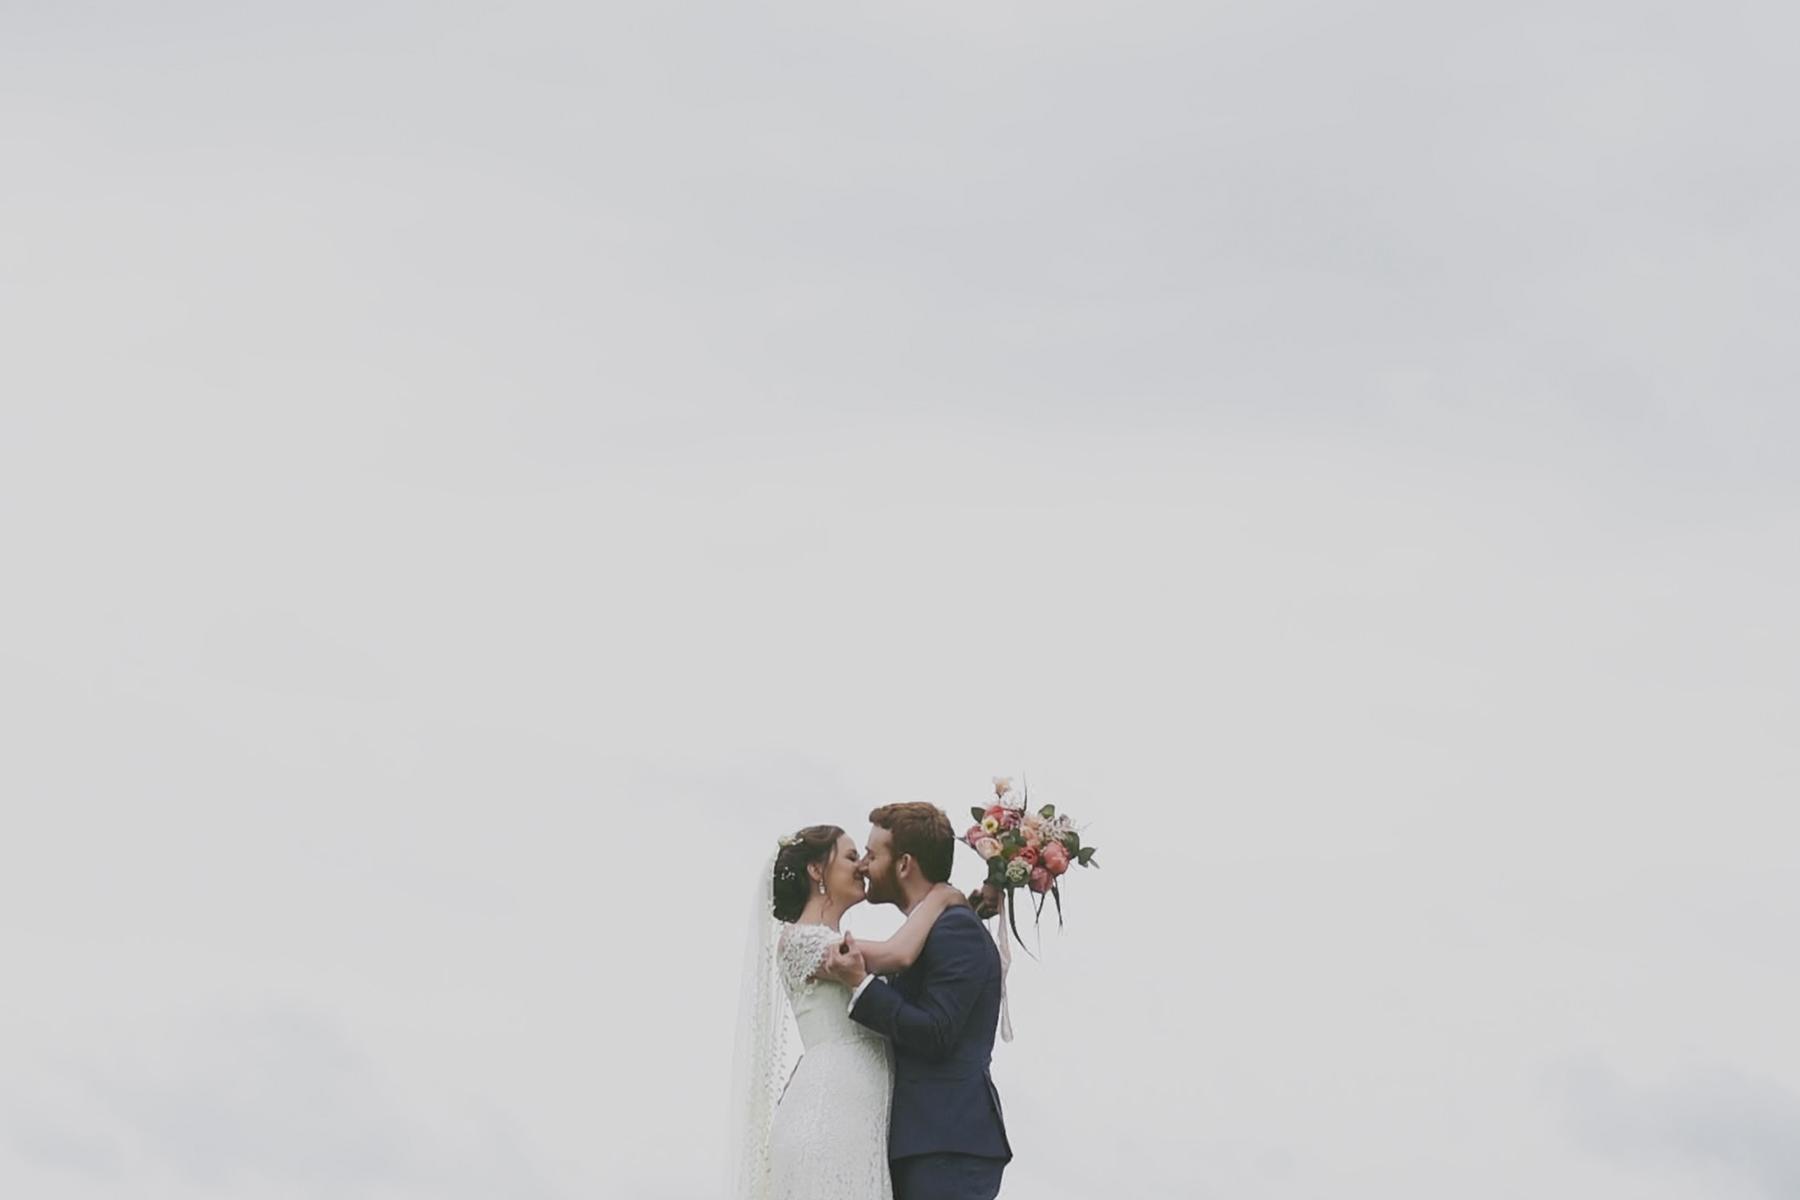 The Oak Grove Spring Wedding - June 2018